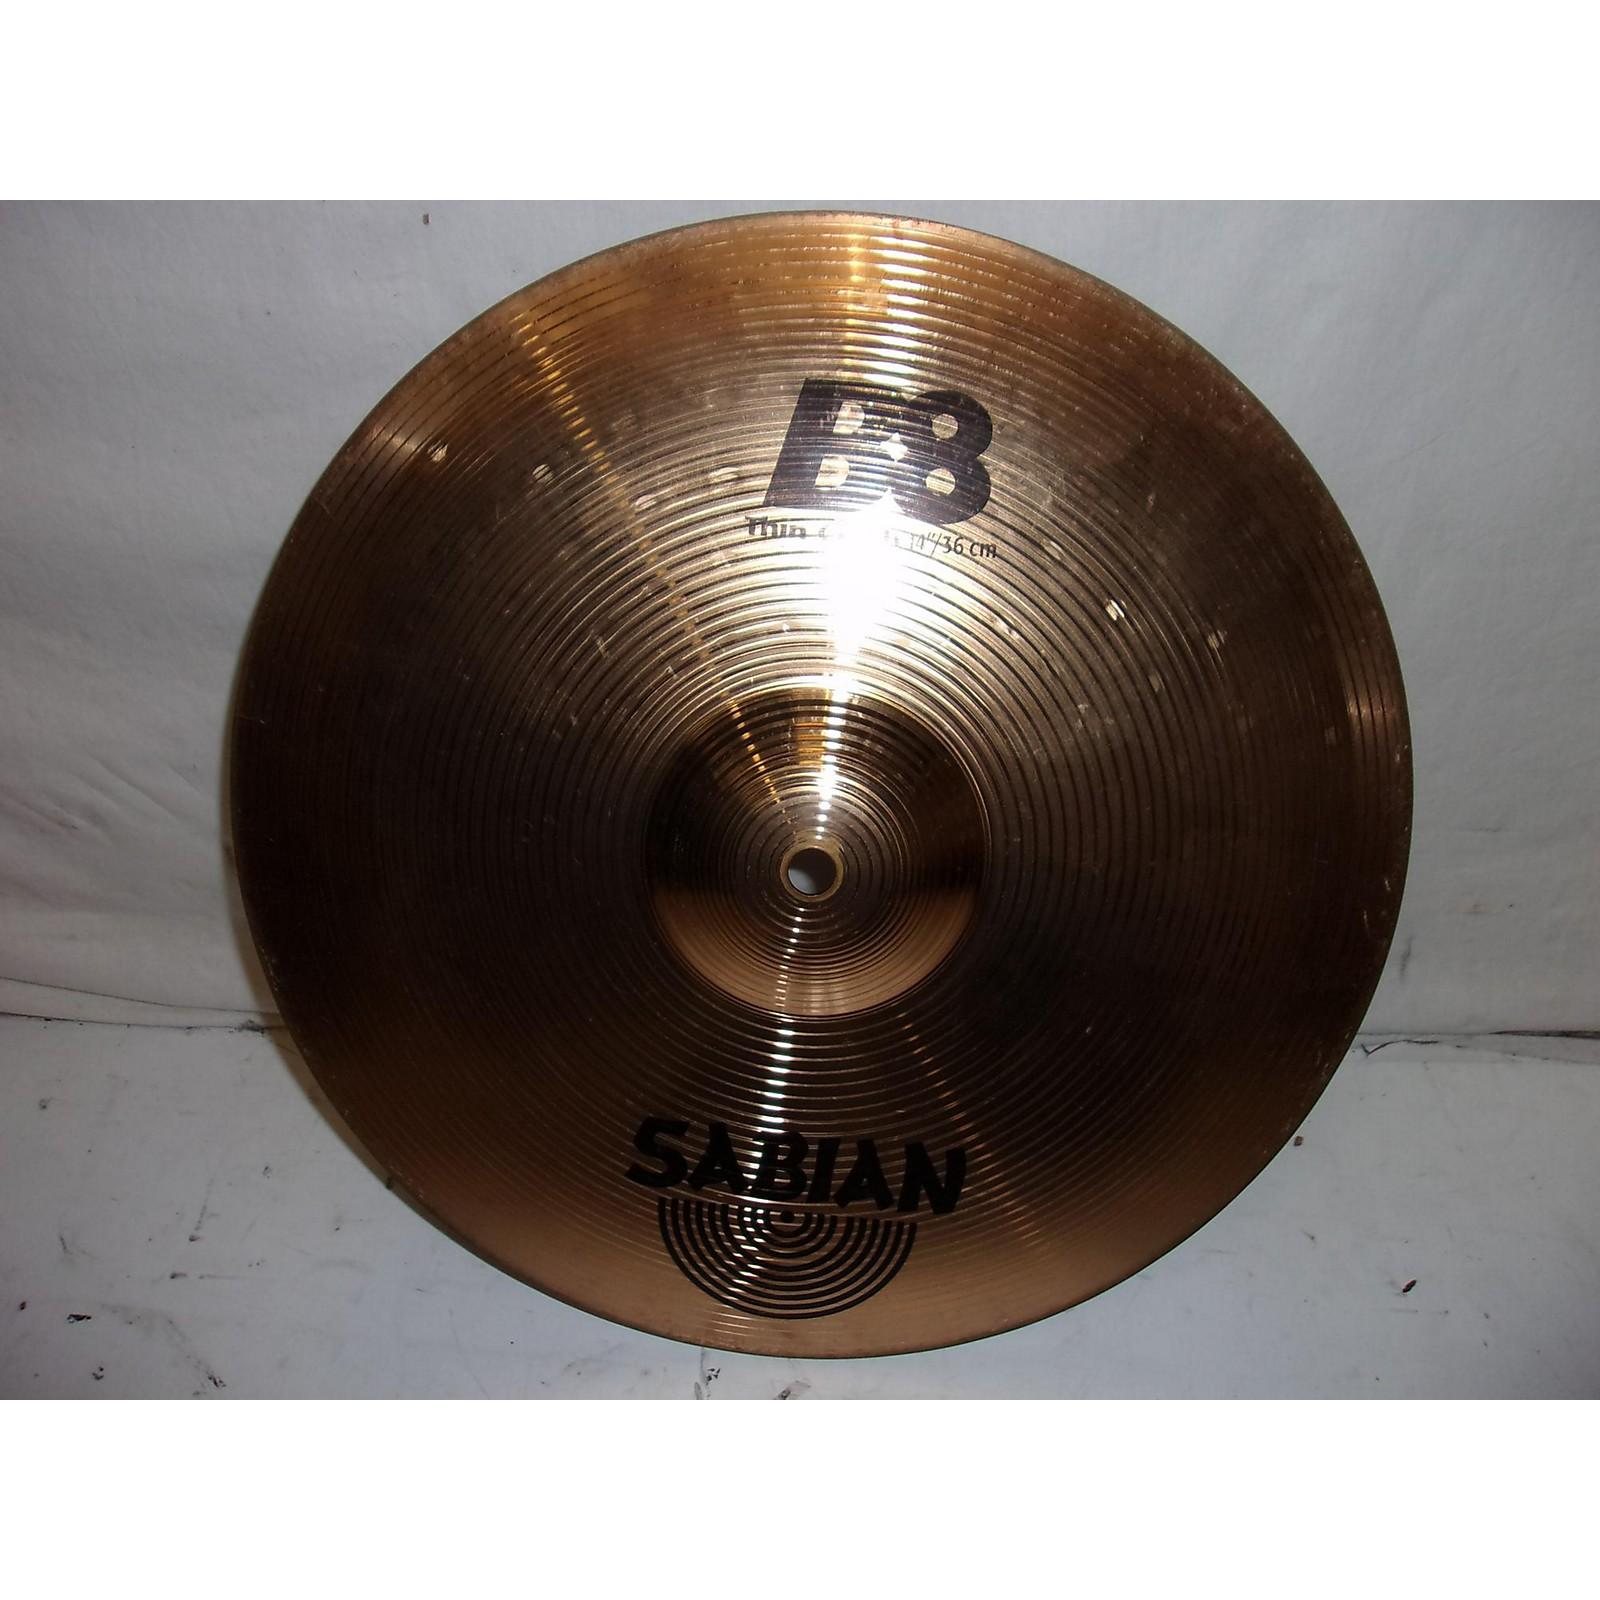 Sabian 2000s 14in B8 Thin Crash Cymbal